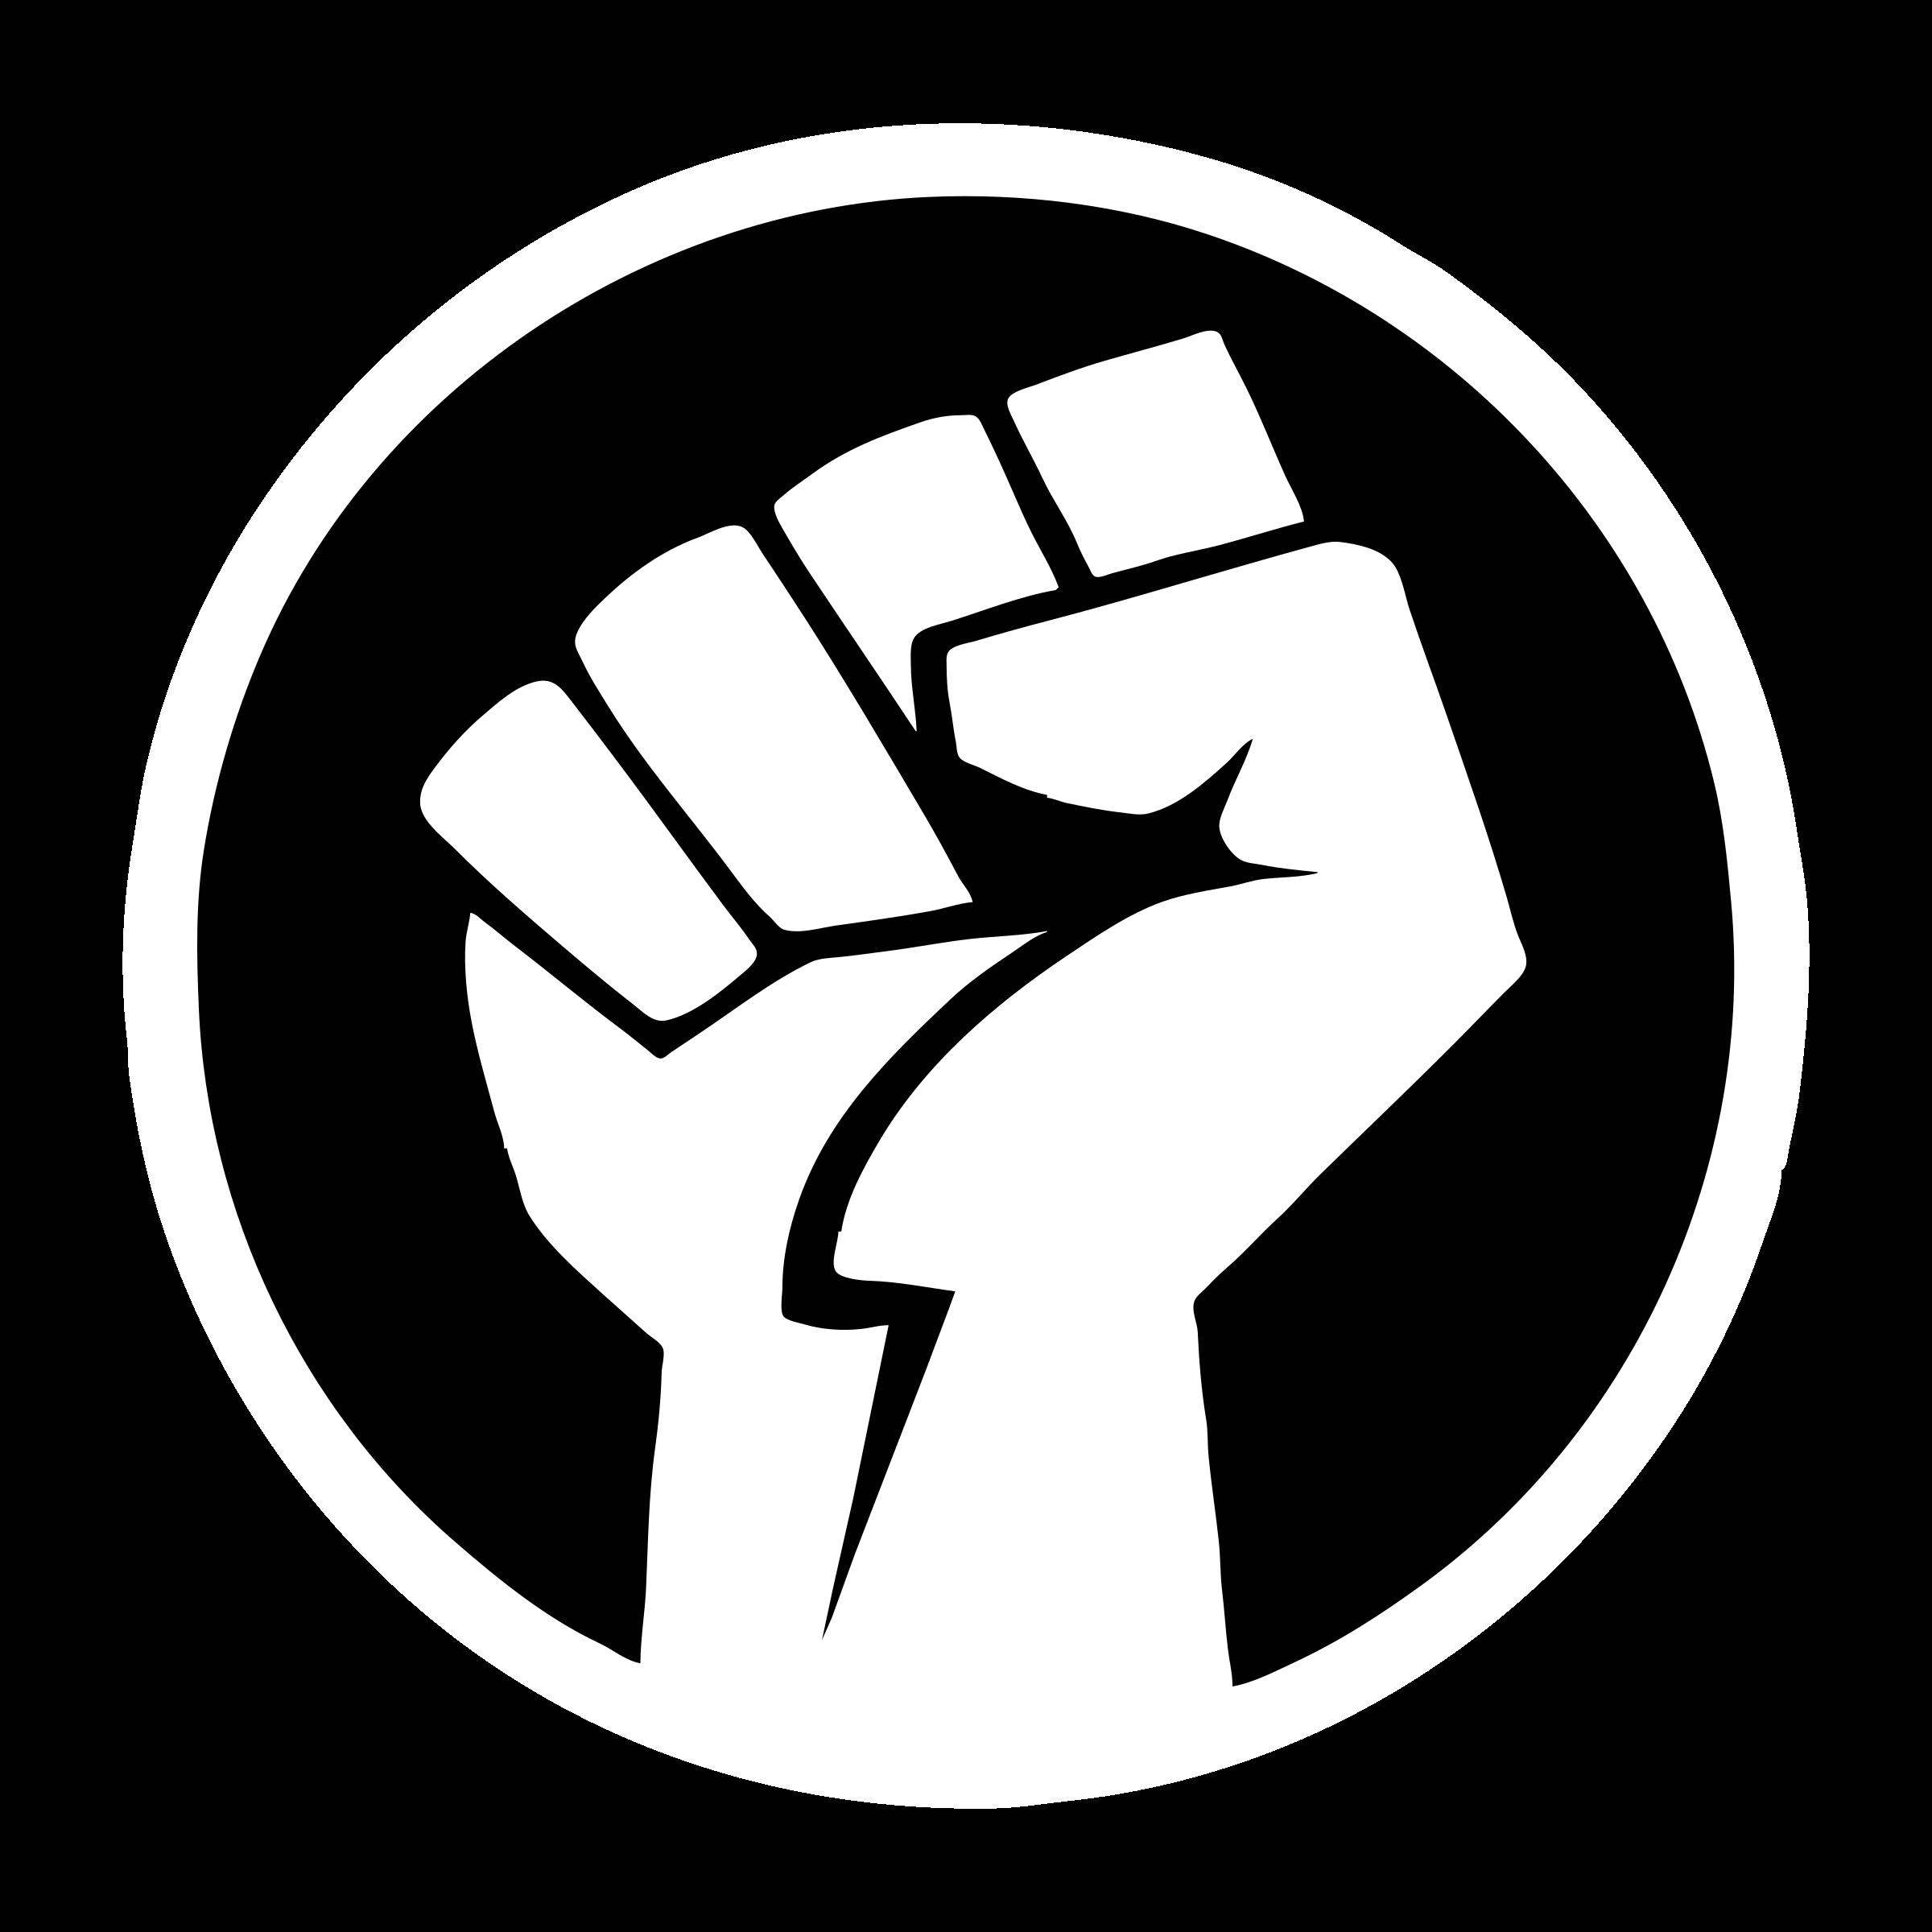 power fist bw by antti leppa clothing brand logo inspiration rh pinterest co uk Luxury Hotel Management Company Logo Leading Department Store Logos